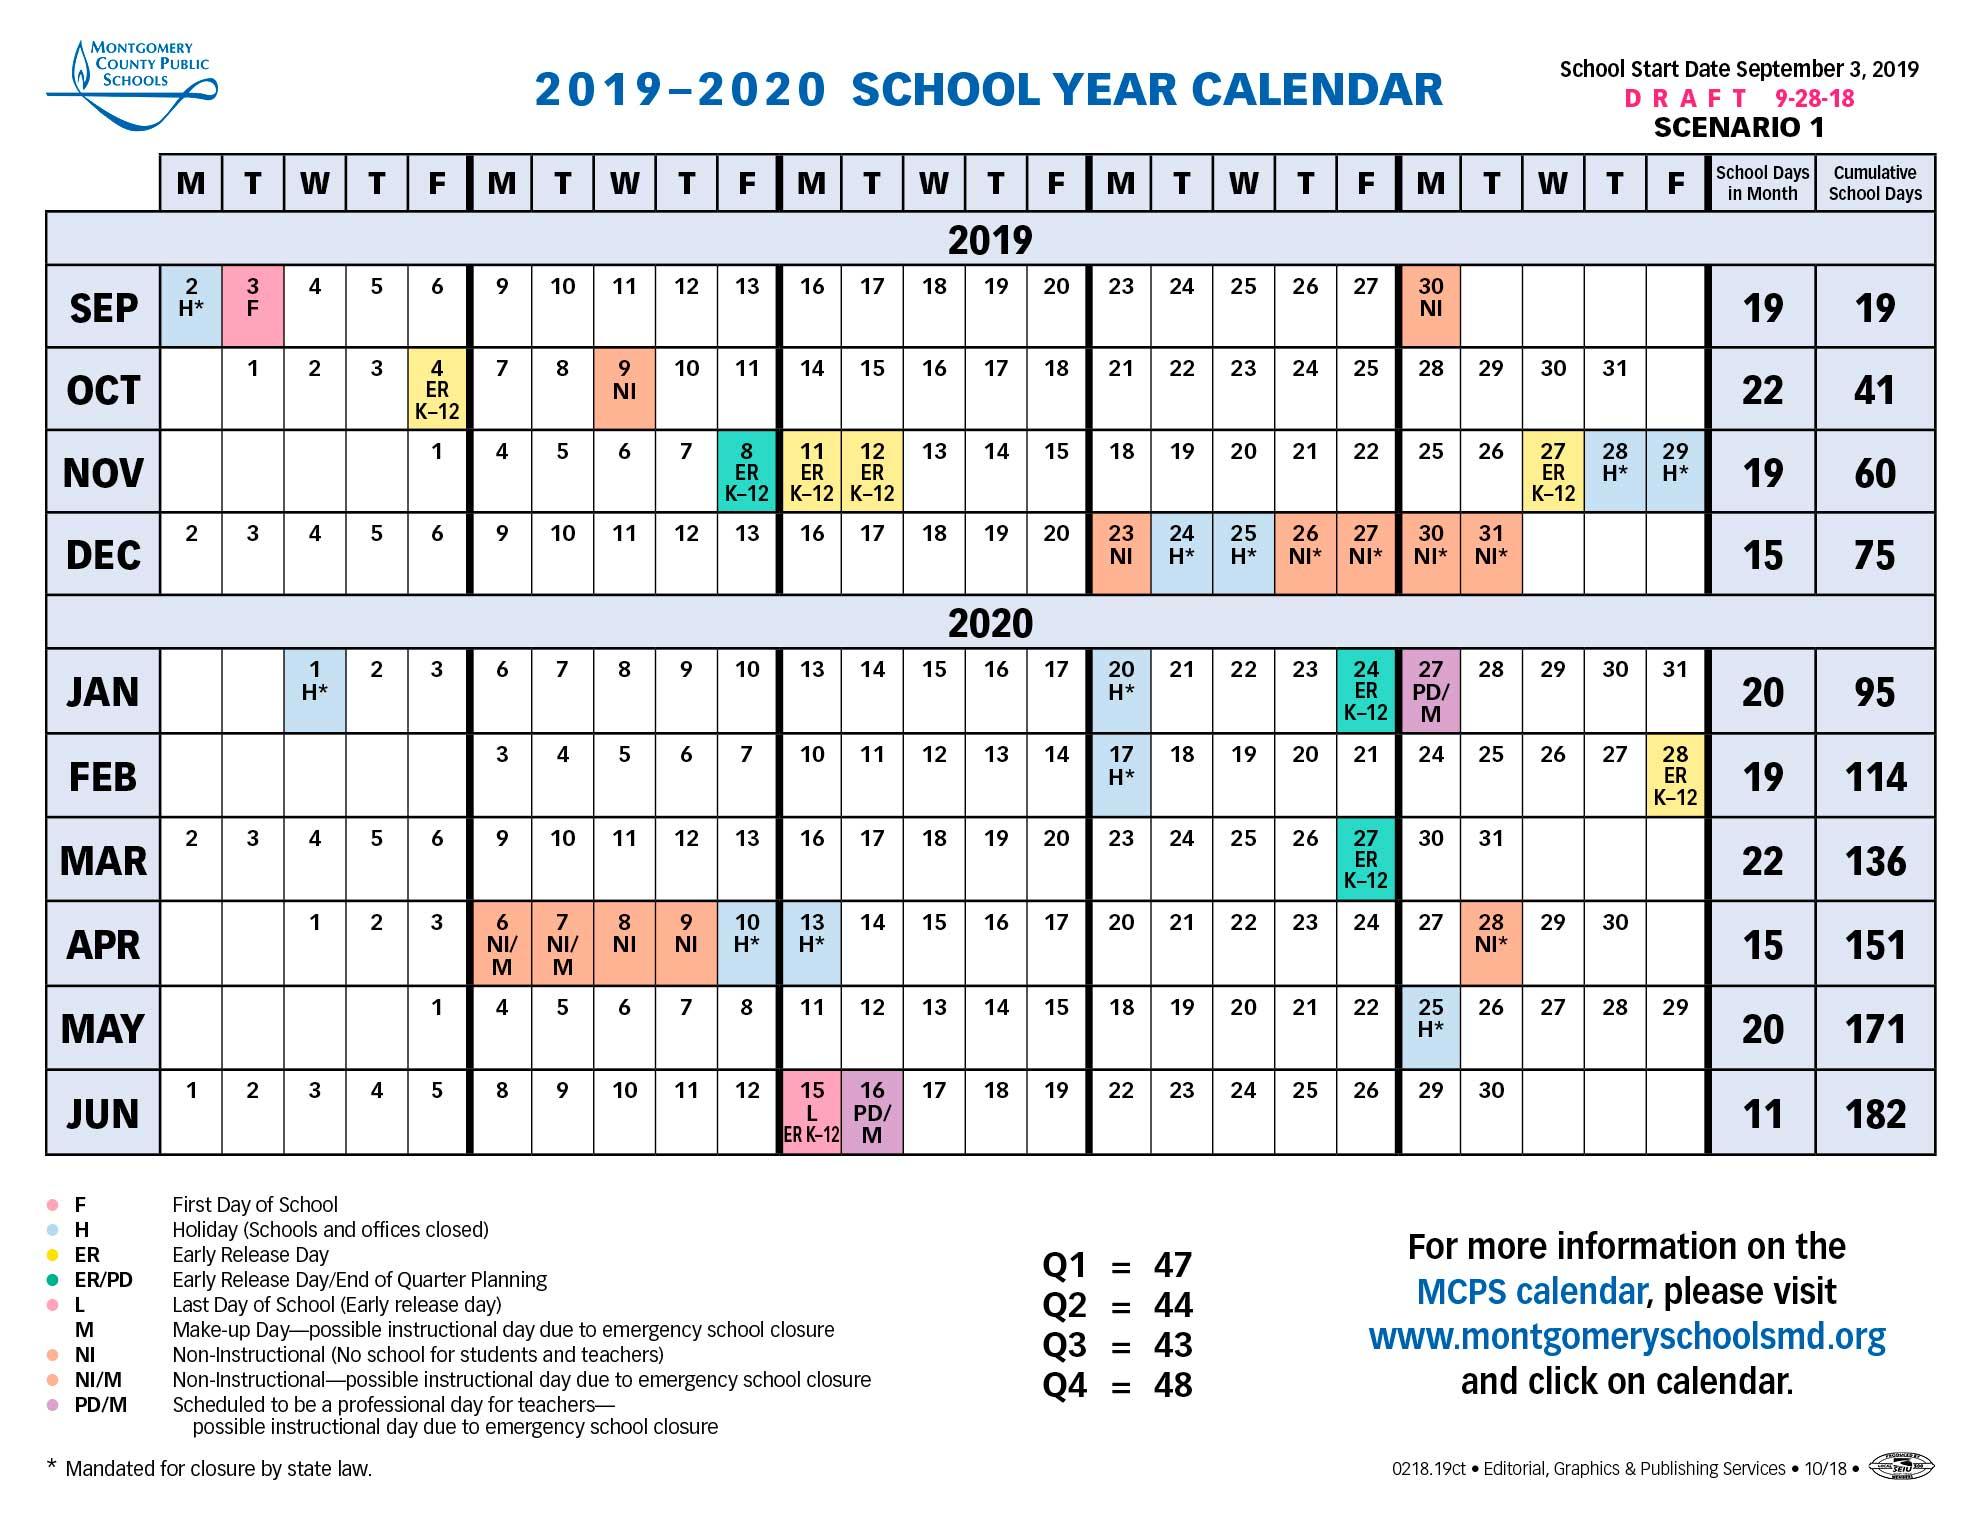 School Board Approves Longer Spring Break For 2019 2020 In Queensborough Community College Printable Calendar 2020